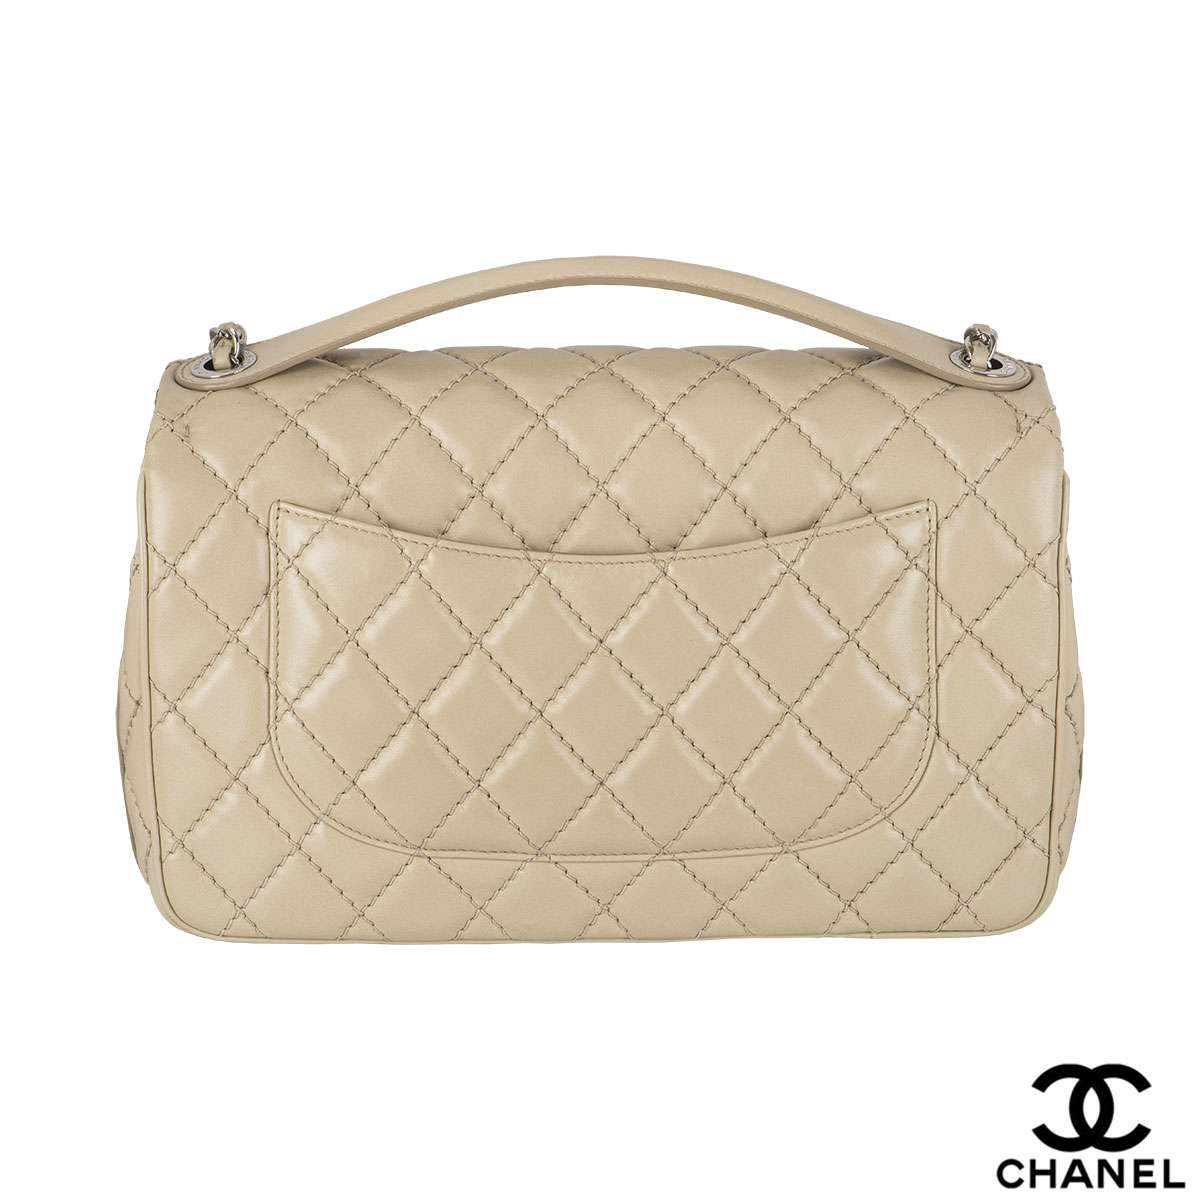 Chanel Ivory Lambskin Top Handle Handbag